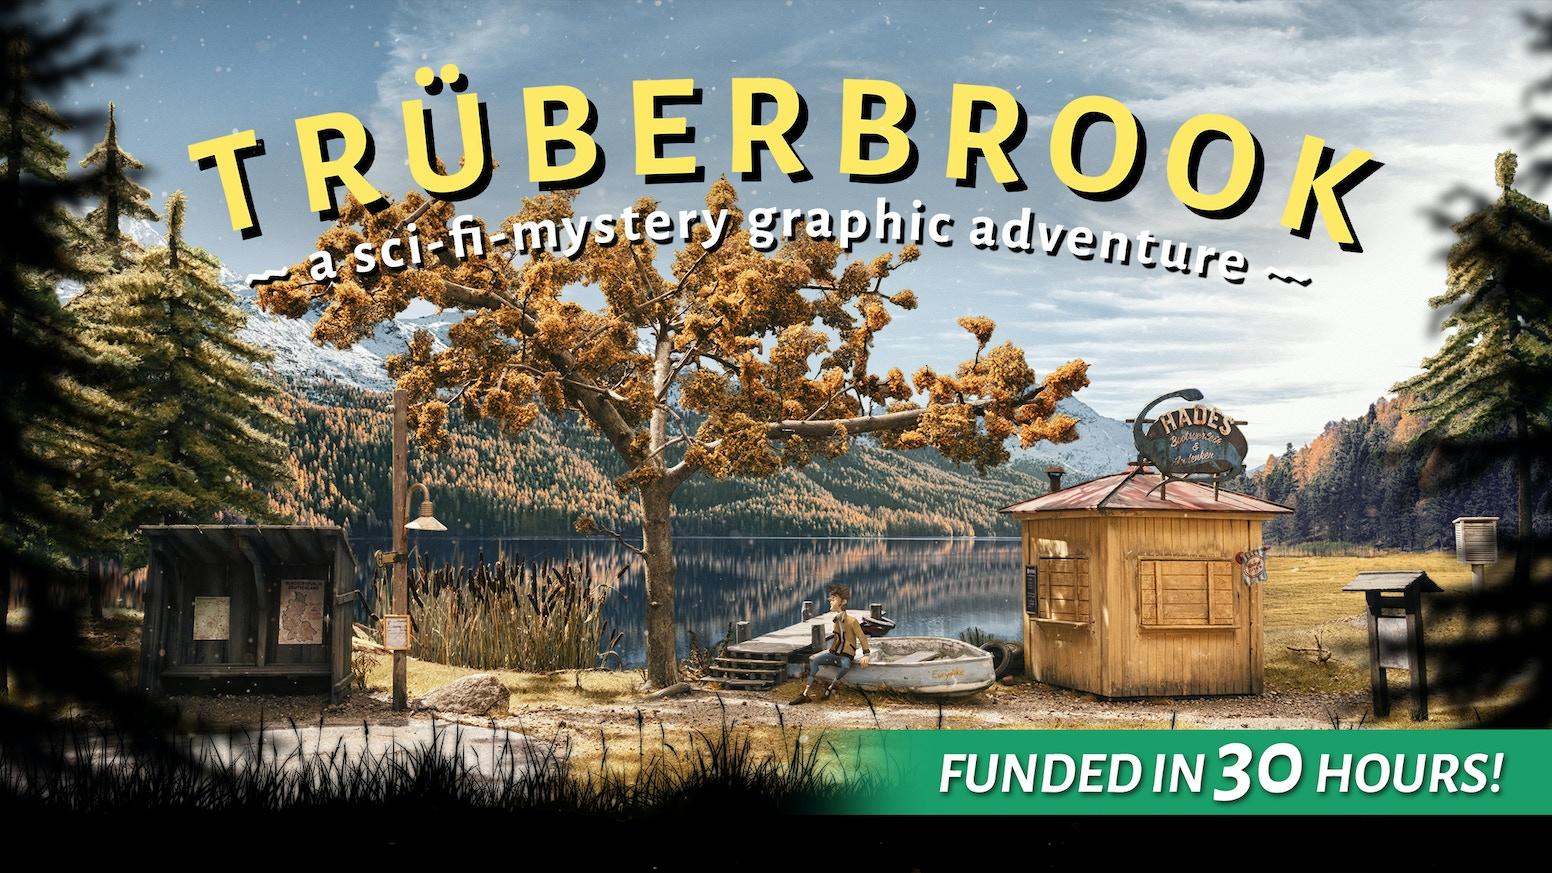 Trberbrook A Nerd Saves The World By Btf Kickstarter Electric Box Walkthrough Science Games Blog Play Enjoy An Adventurous Vacation To 1960s Parallel Universe Sci Fi Mystery